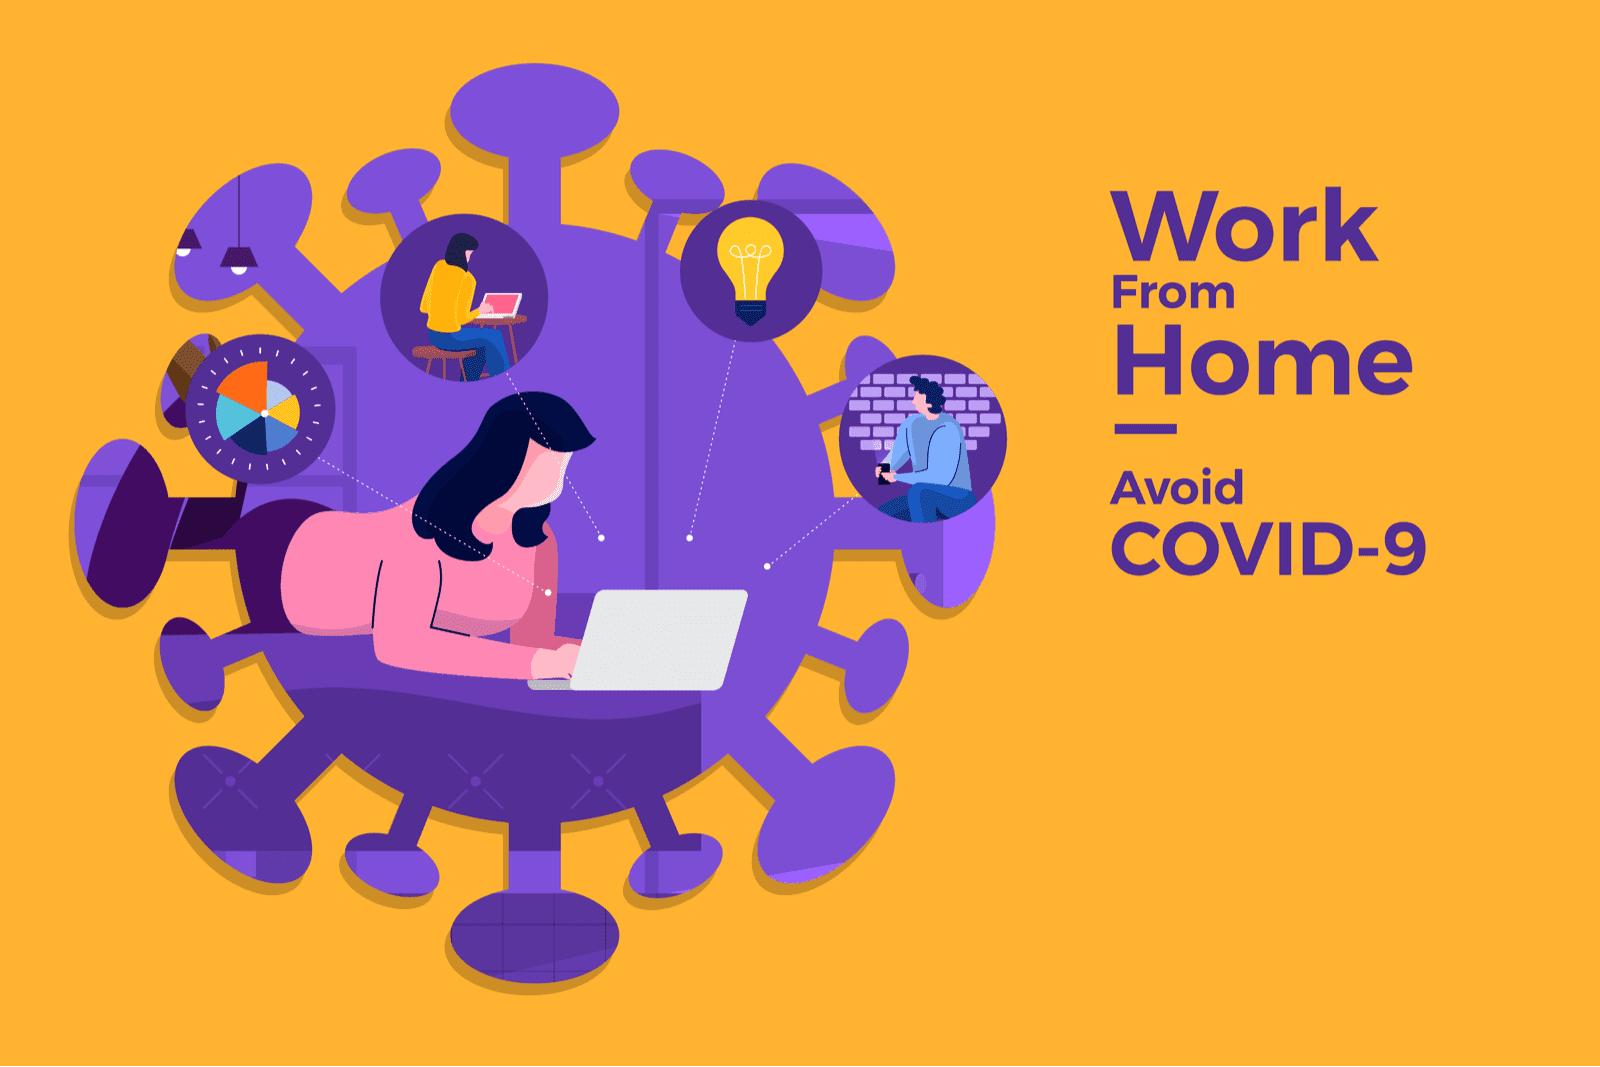 Dear HR, Ini Tips Atur Tim saat Work From Home agar Tetap Produktif